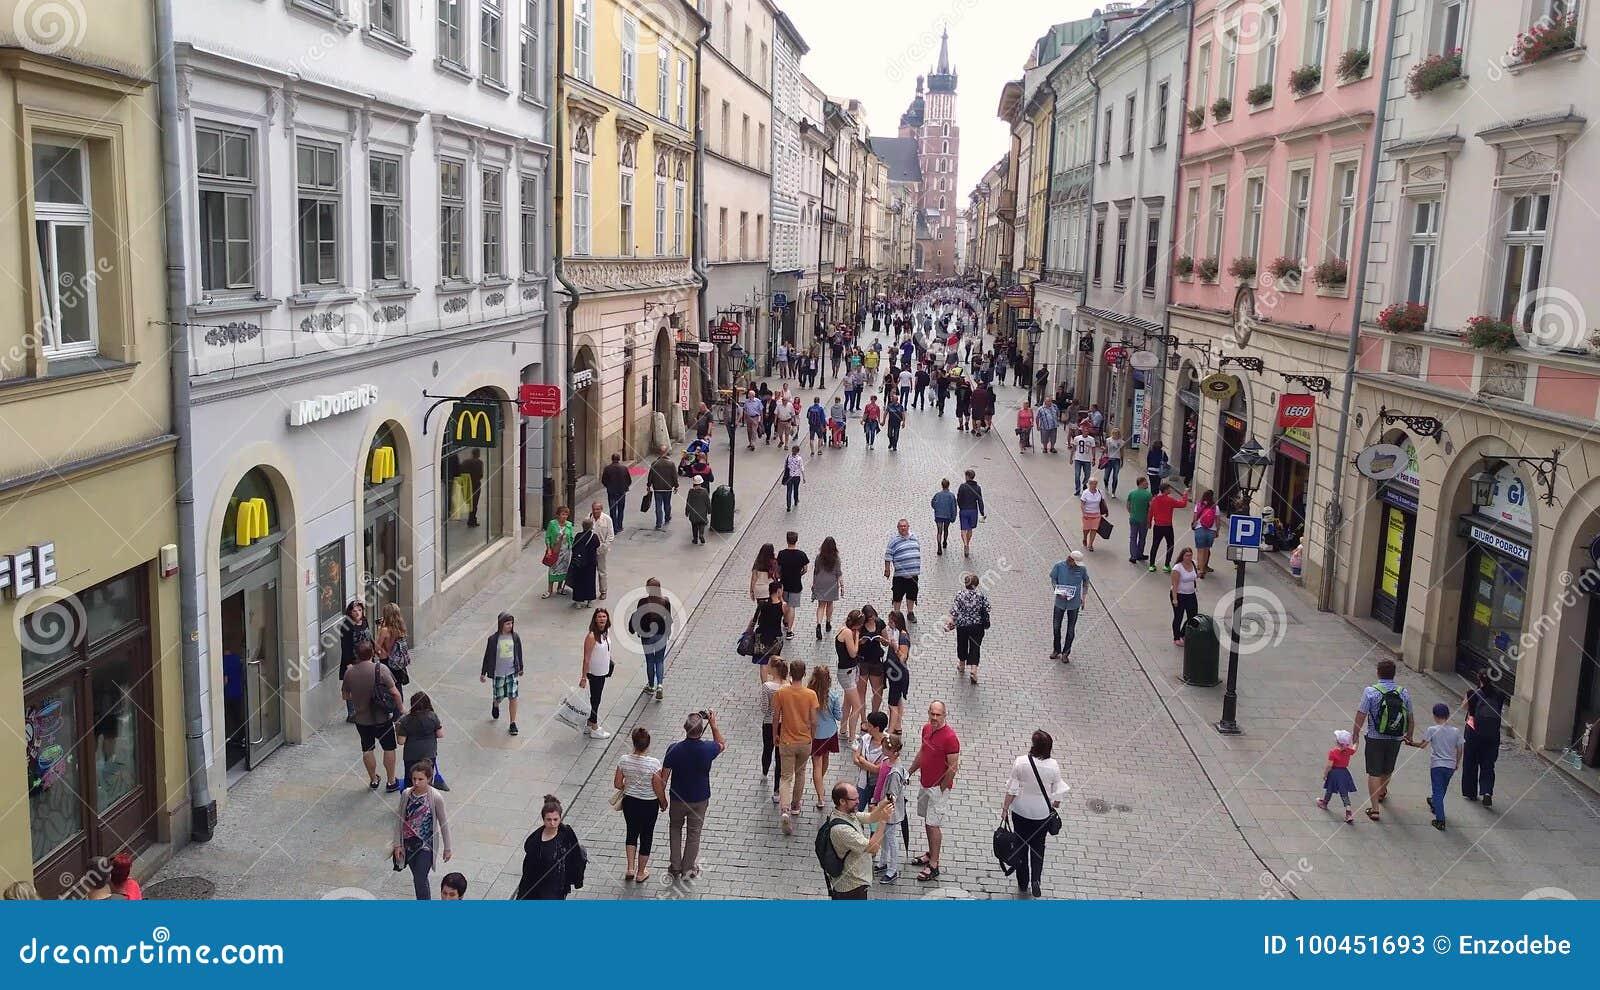 dating krakow poland ægteskab ikke dating izle yeppudaa